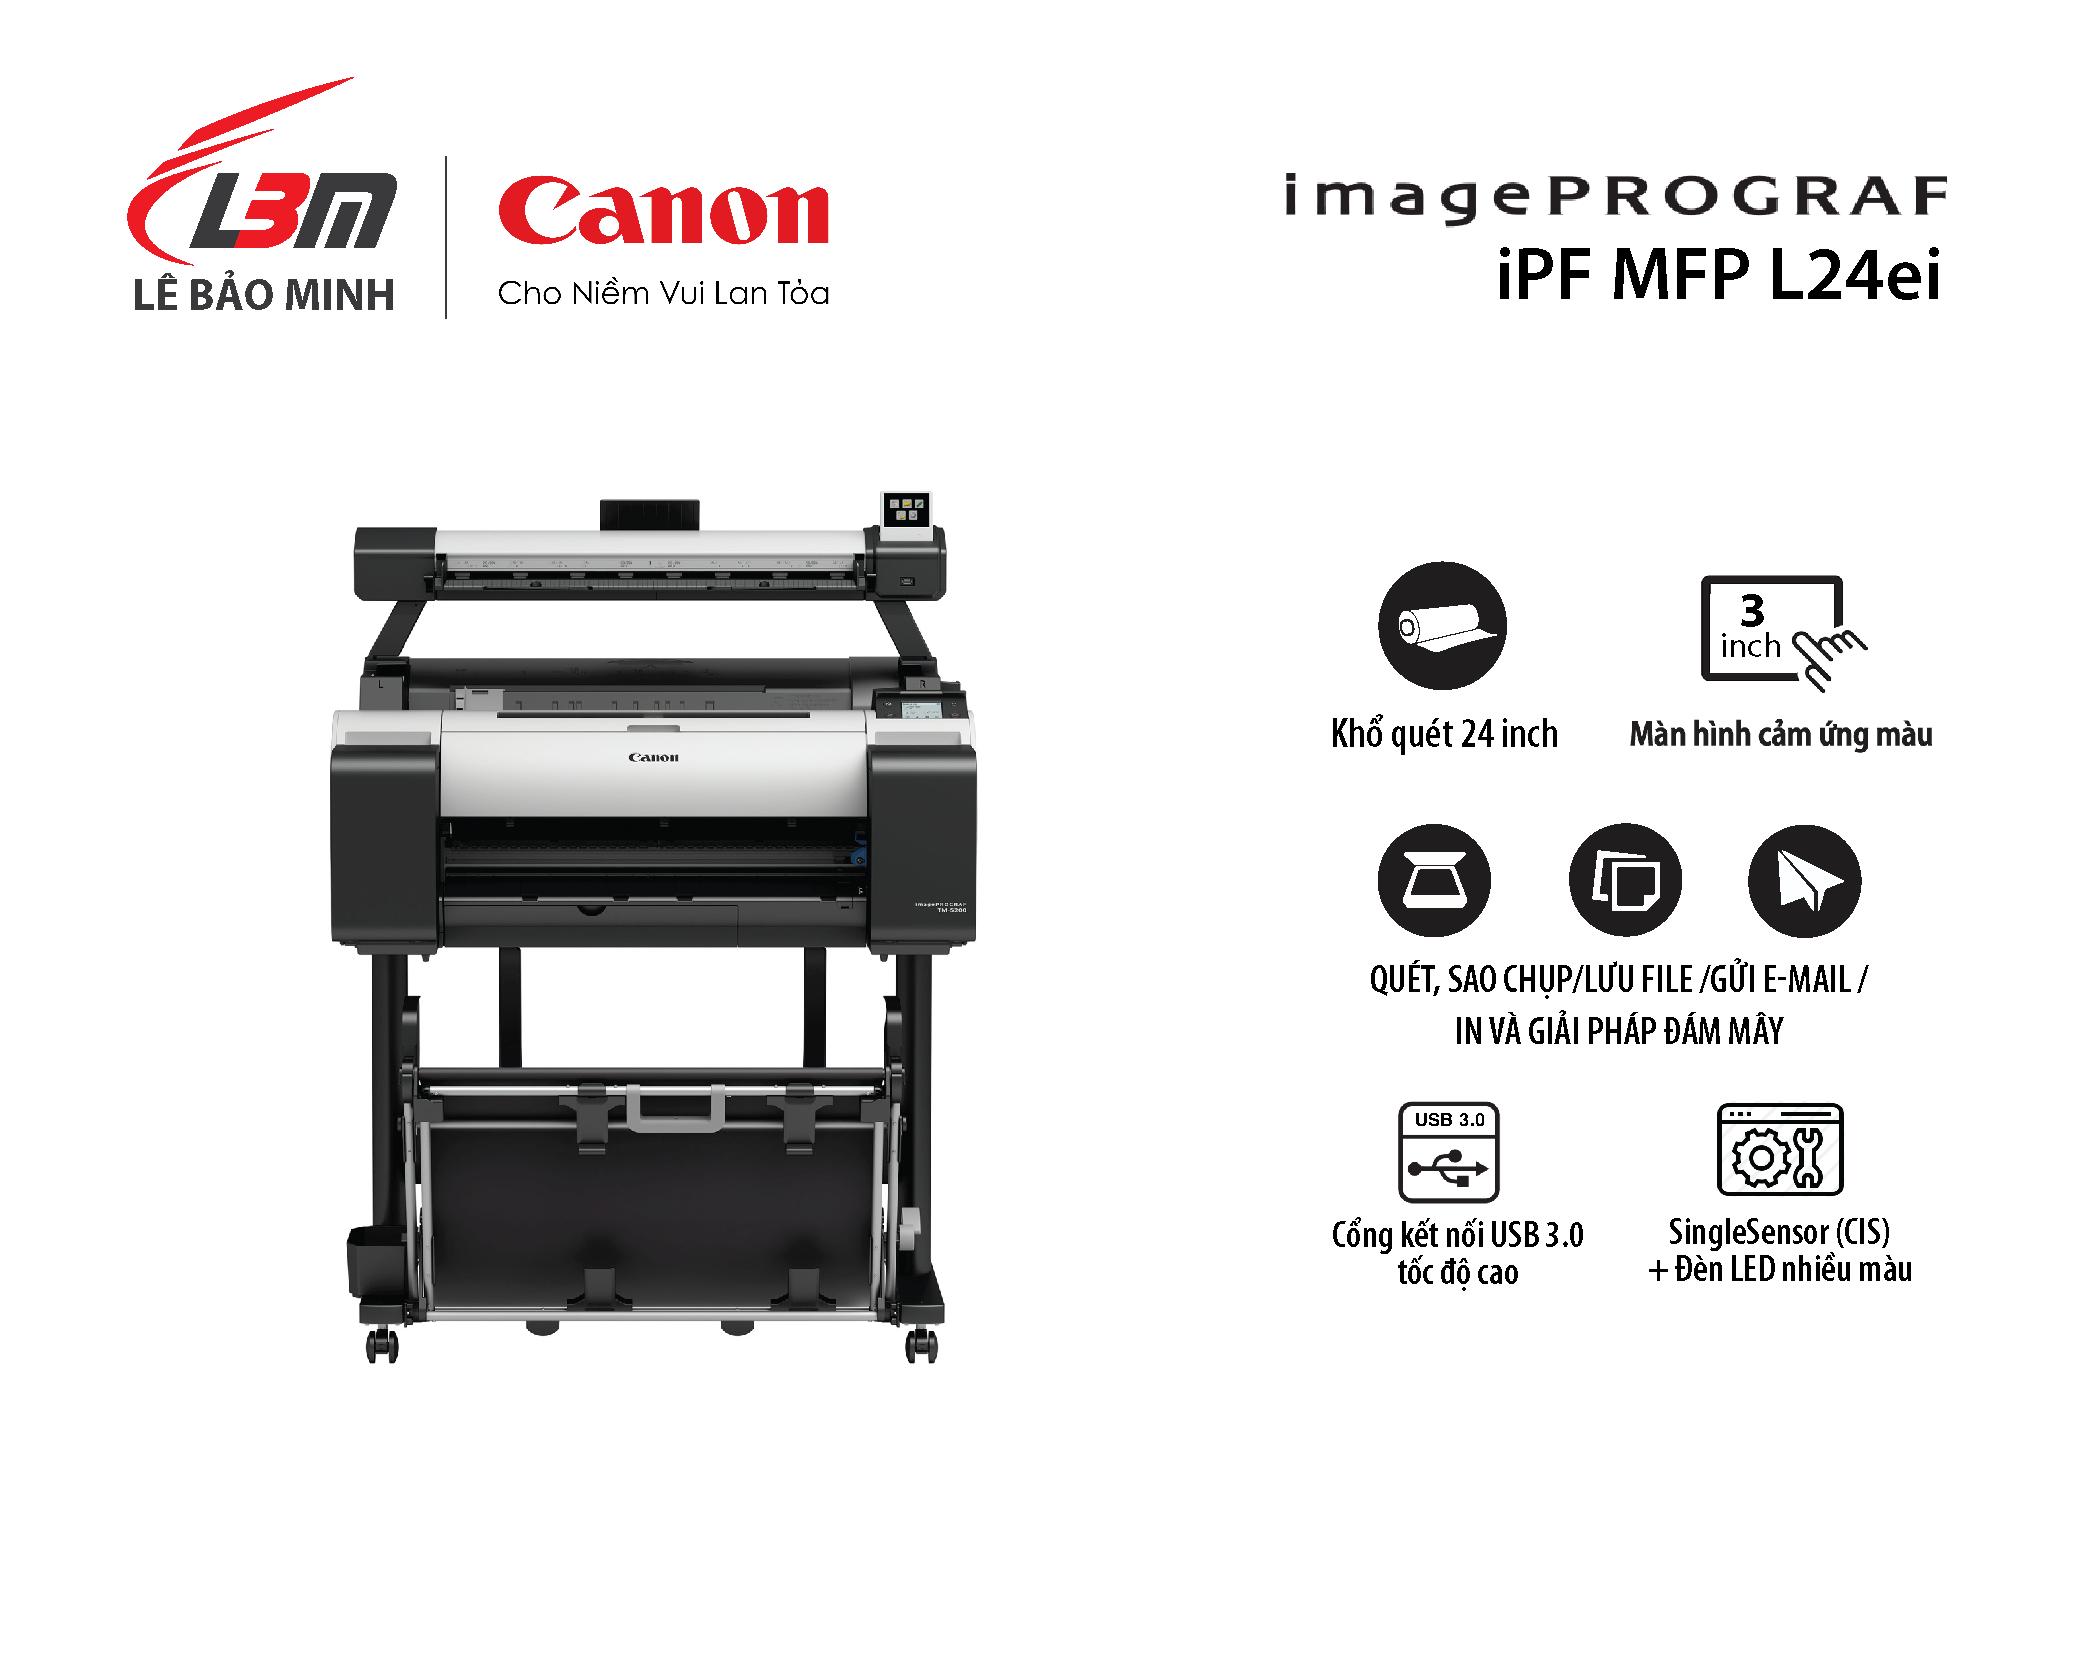 imagePROGRAF iPF MFP L24ei (dùng cho máy TM-5200 / TM-5205)